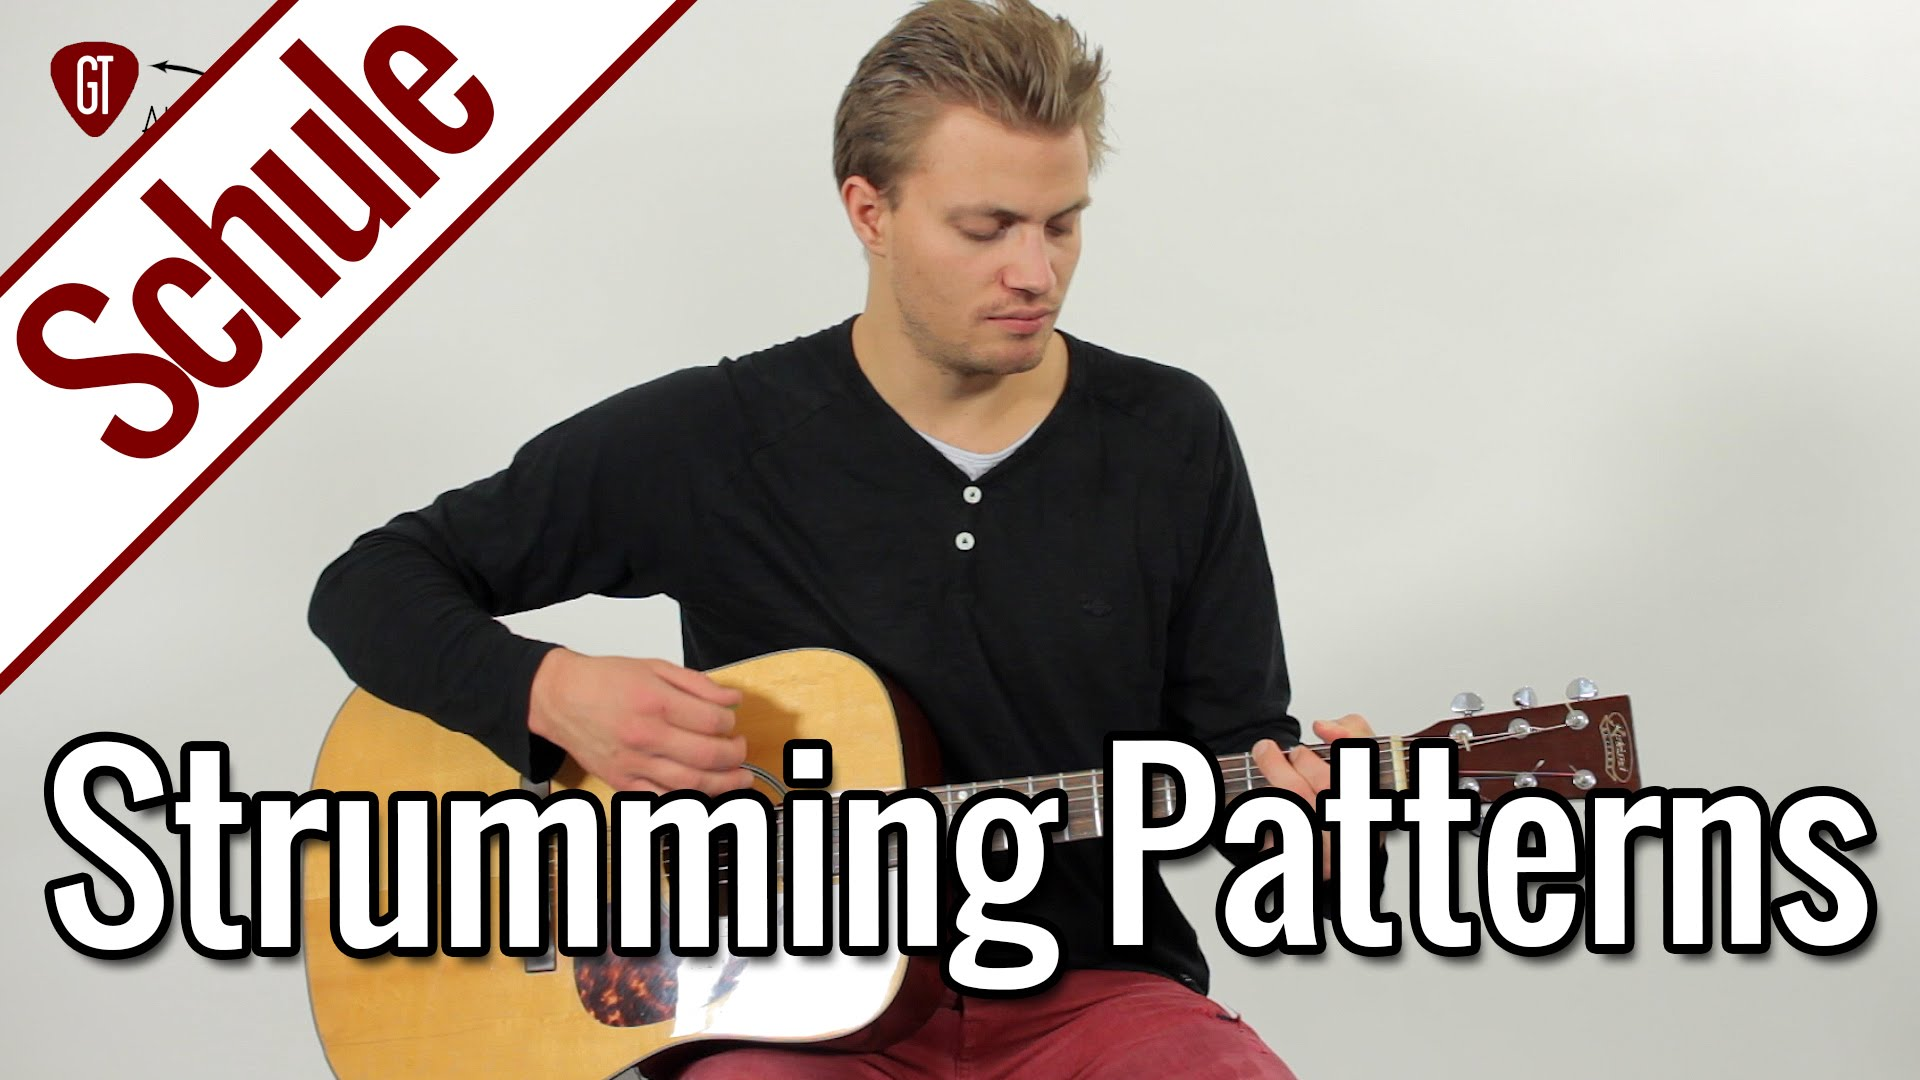 Gitarre lernen – Fünfte Gitarrenstunde: Strumming Patterns | Gitarrenschule